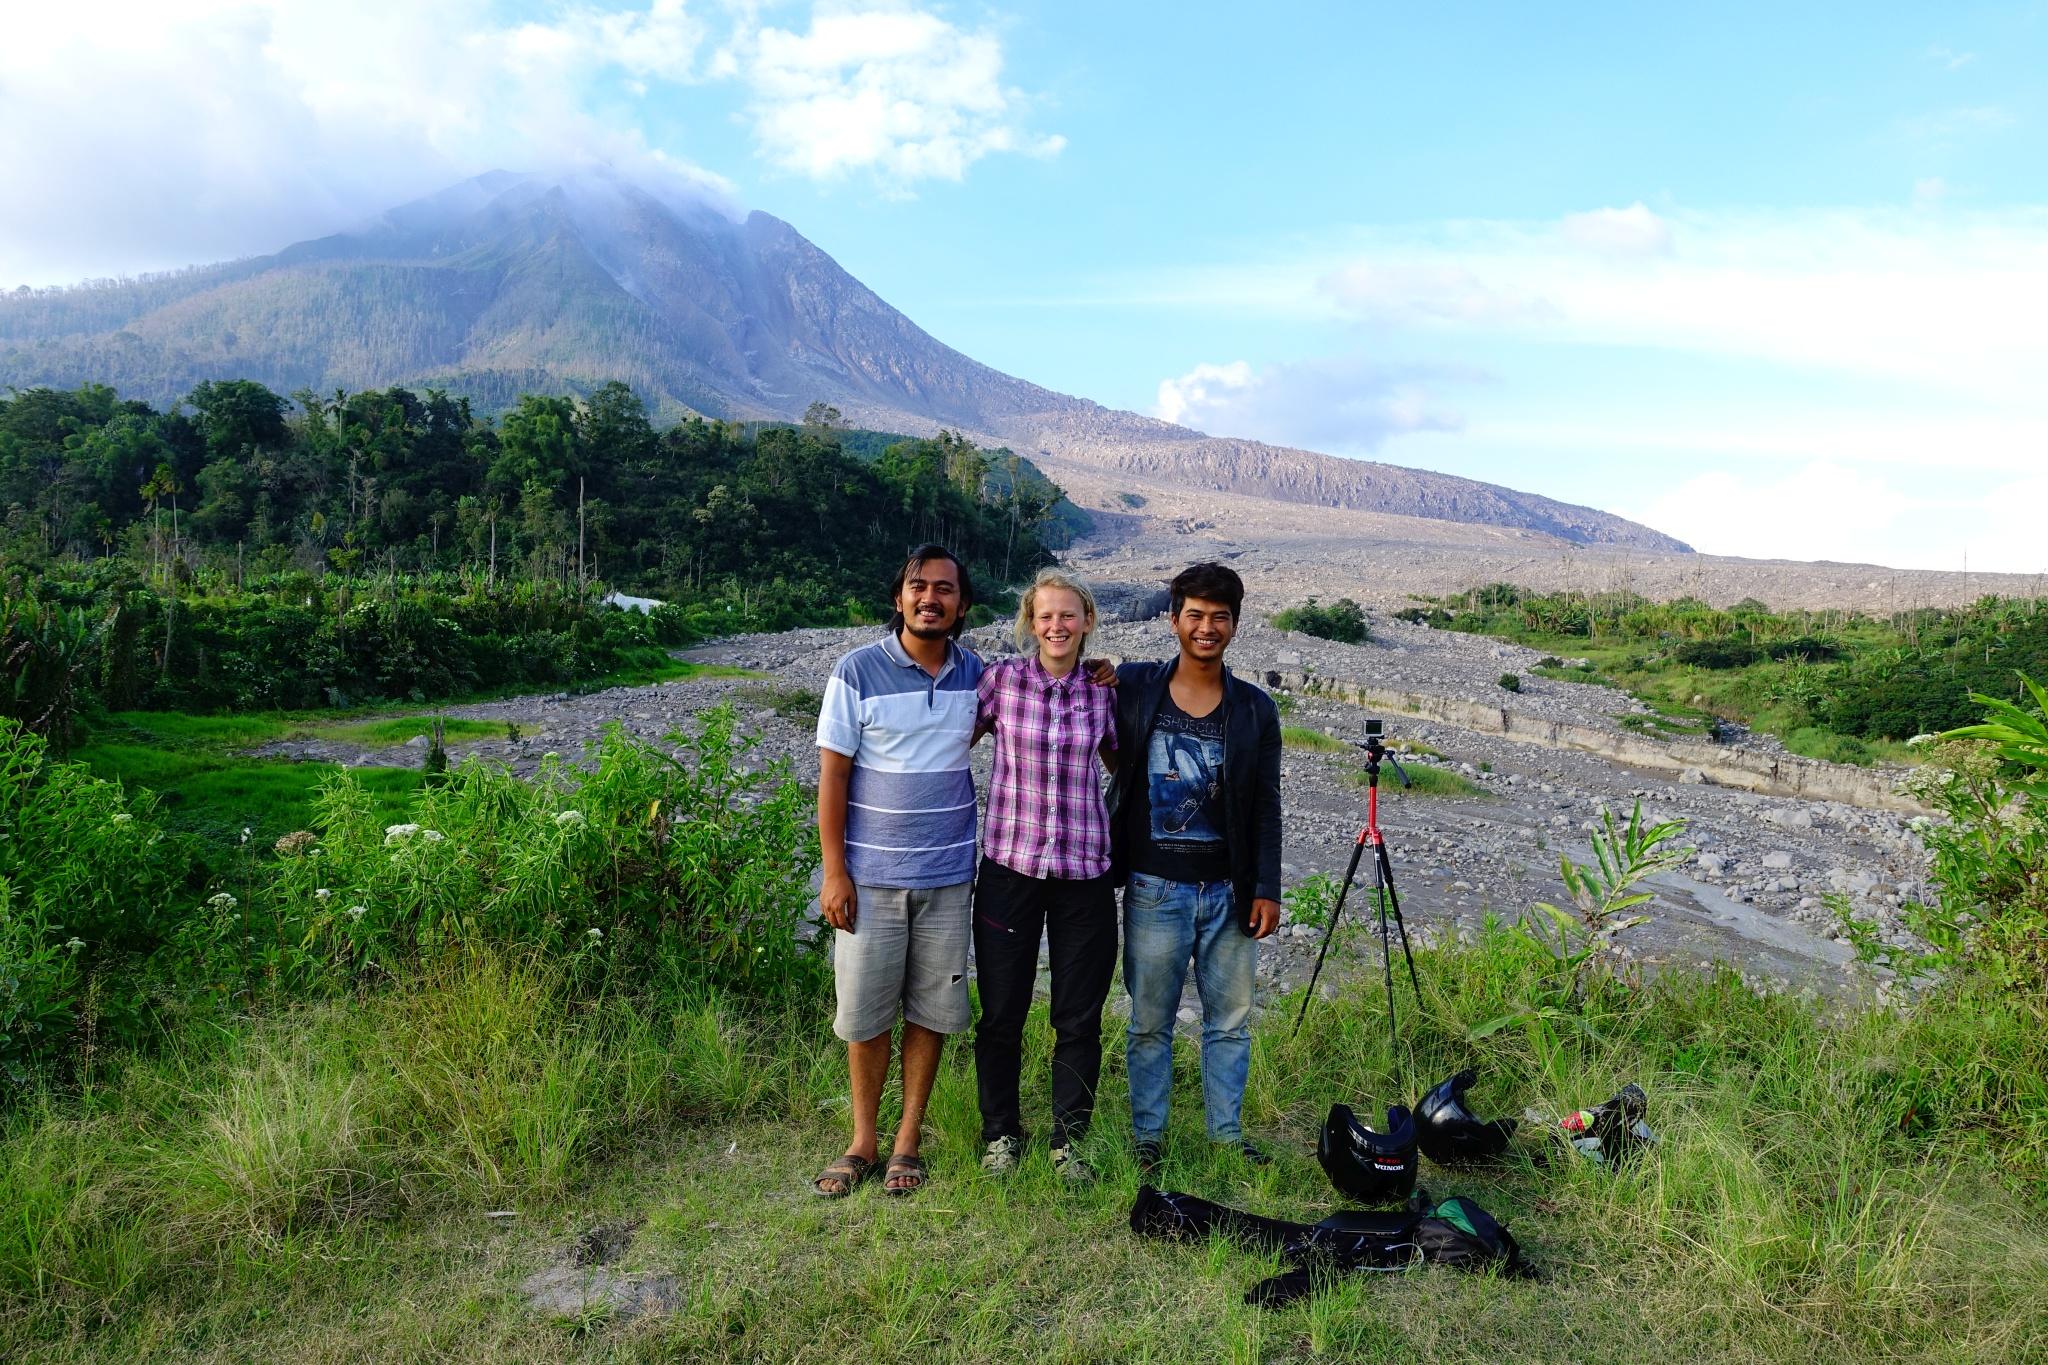 Lemmik vulkaan & Sumatralt Eestisse